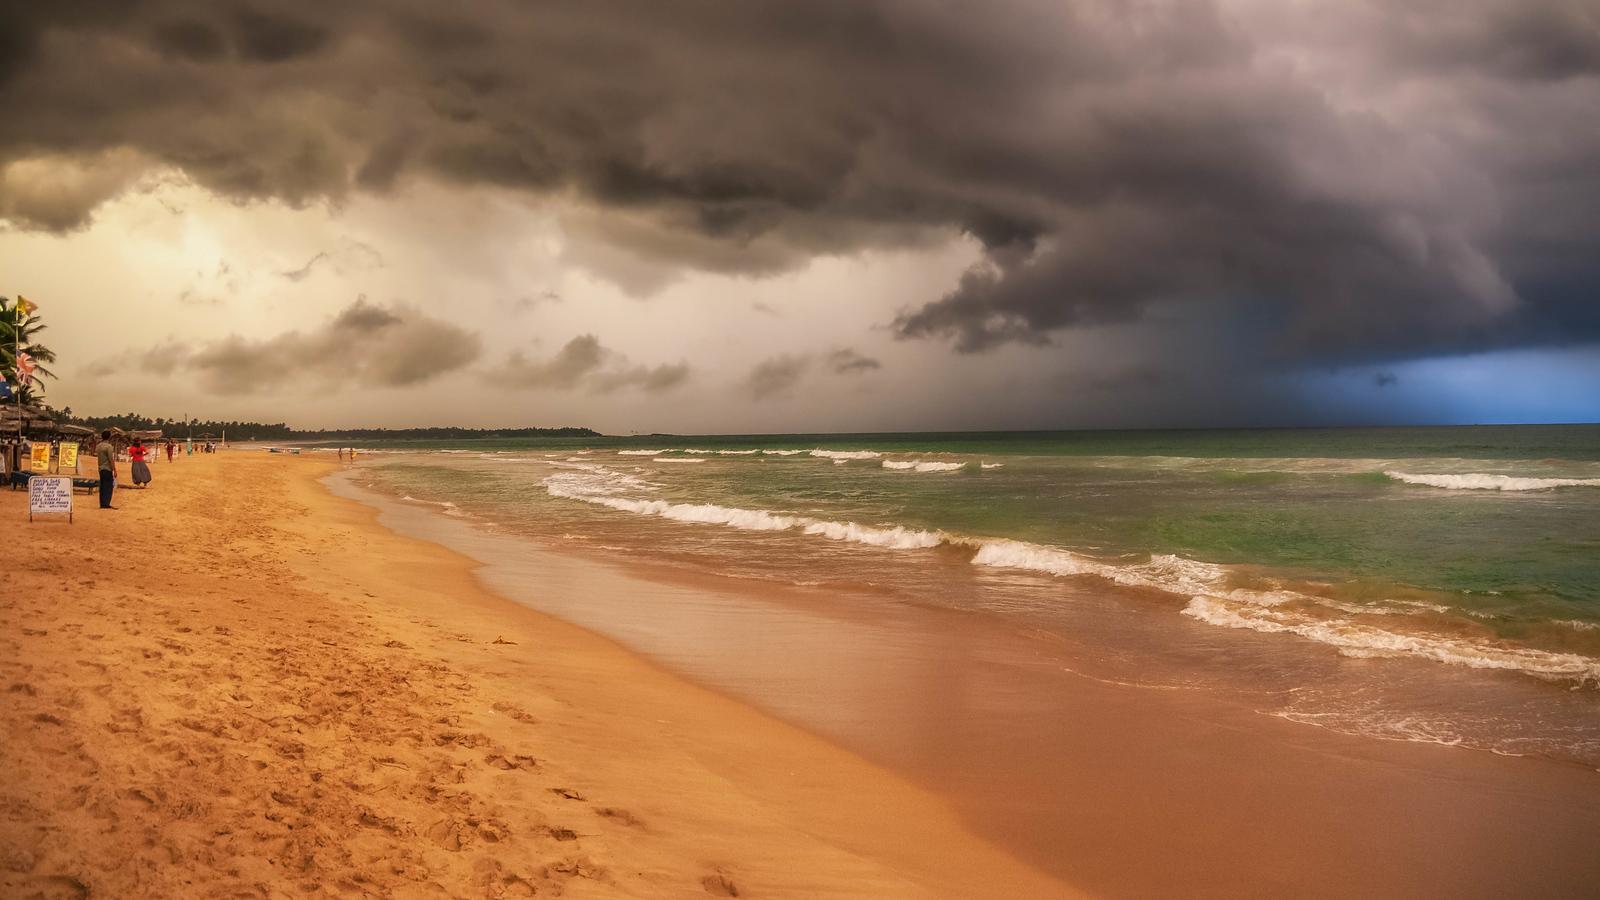 A storm rolls in over the beach in Hikkadua, Sri Lanka